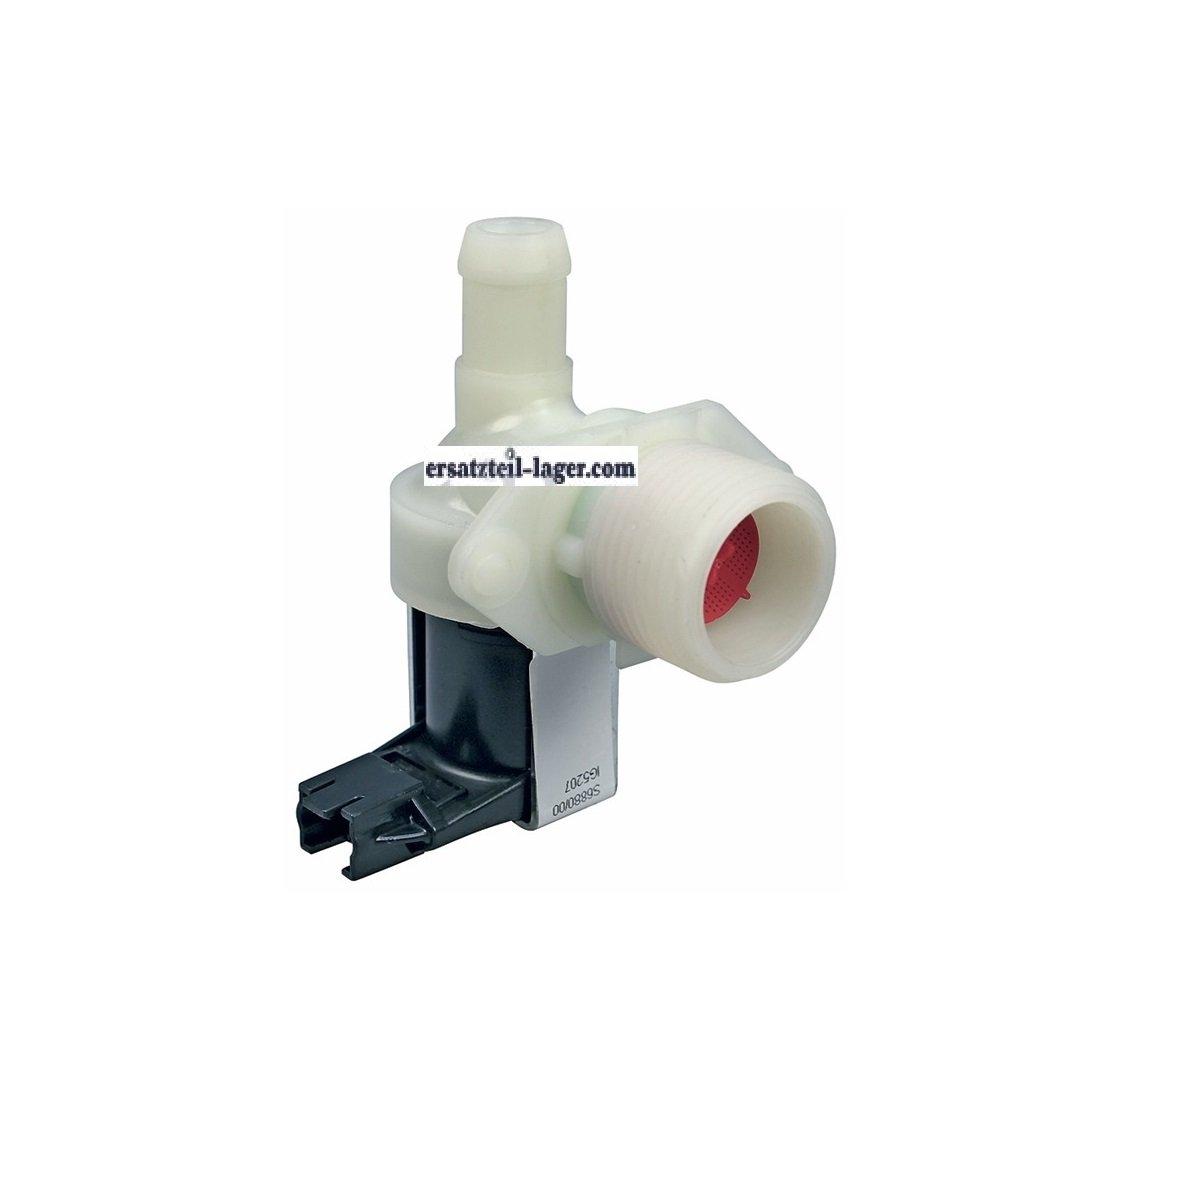 Alternativ magnético Válvula Válvula de 1 Compartimento 90 ° 14,0 ...